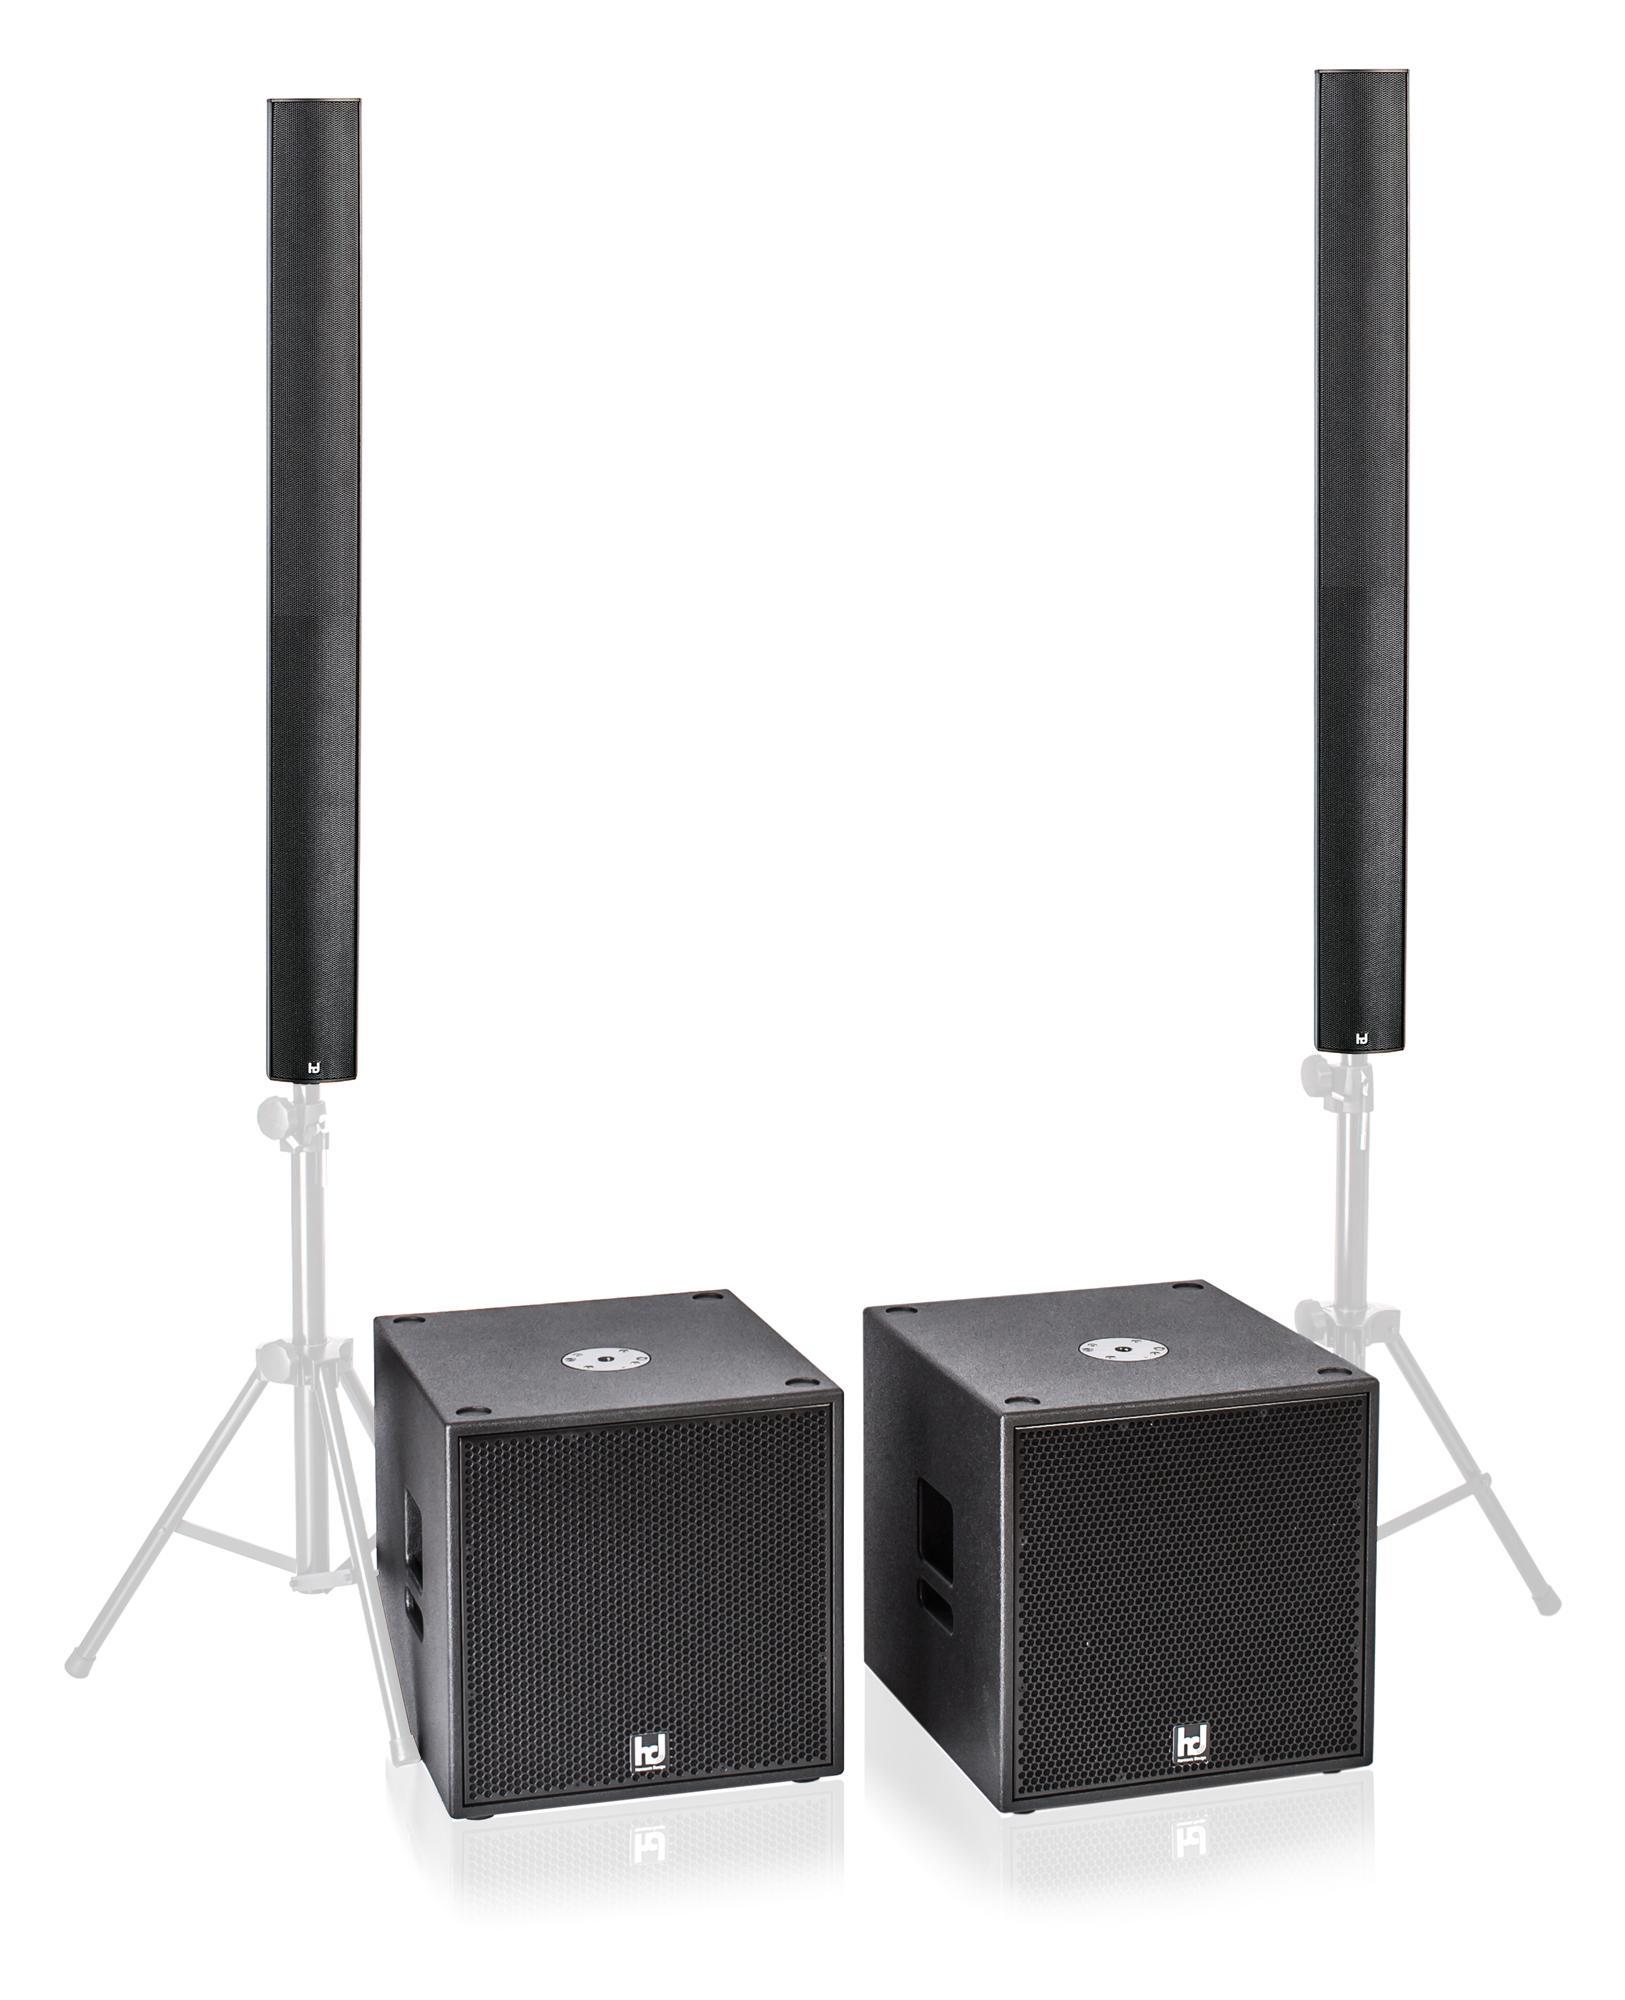 Harmonic Design PL12|P15 PA1 Multi DSP Aktivsystem 3700 Watt